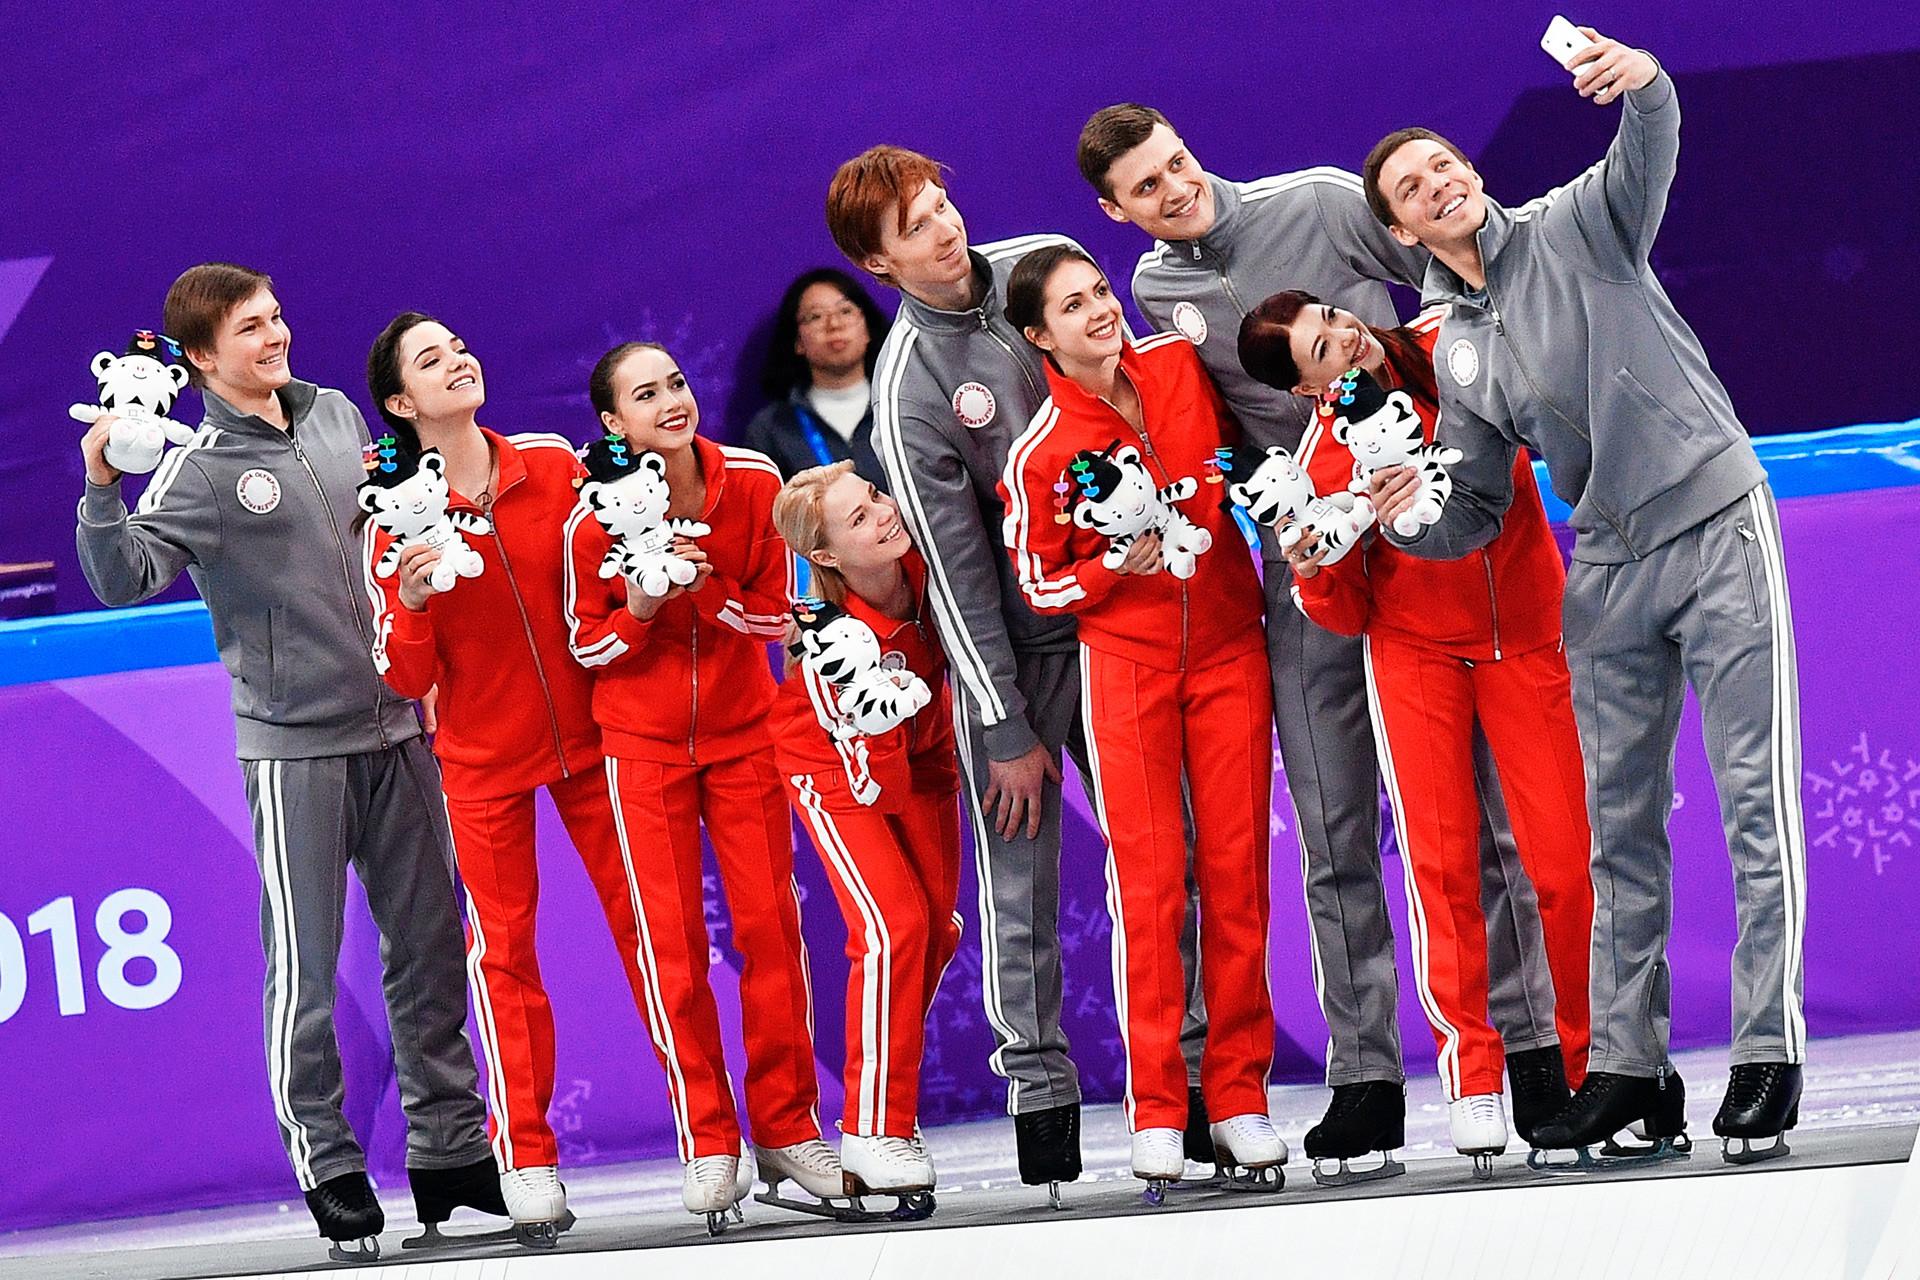 Figure skating team from Russia, L-R: Mikhail Kolyada, Evgenia Medvedeva, Alina Zagitova, Evgenia Tarasova & Vladimir Morozov, Natalya Zabiyako & Alexander Enbert, Ekaterina Bobrova & Dmitri Soloviev